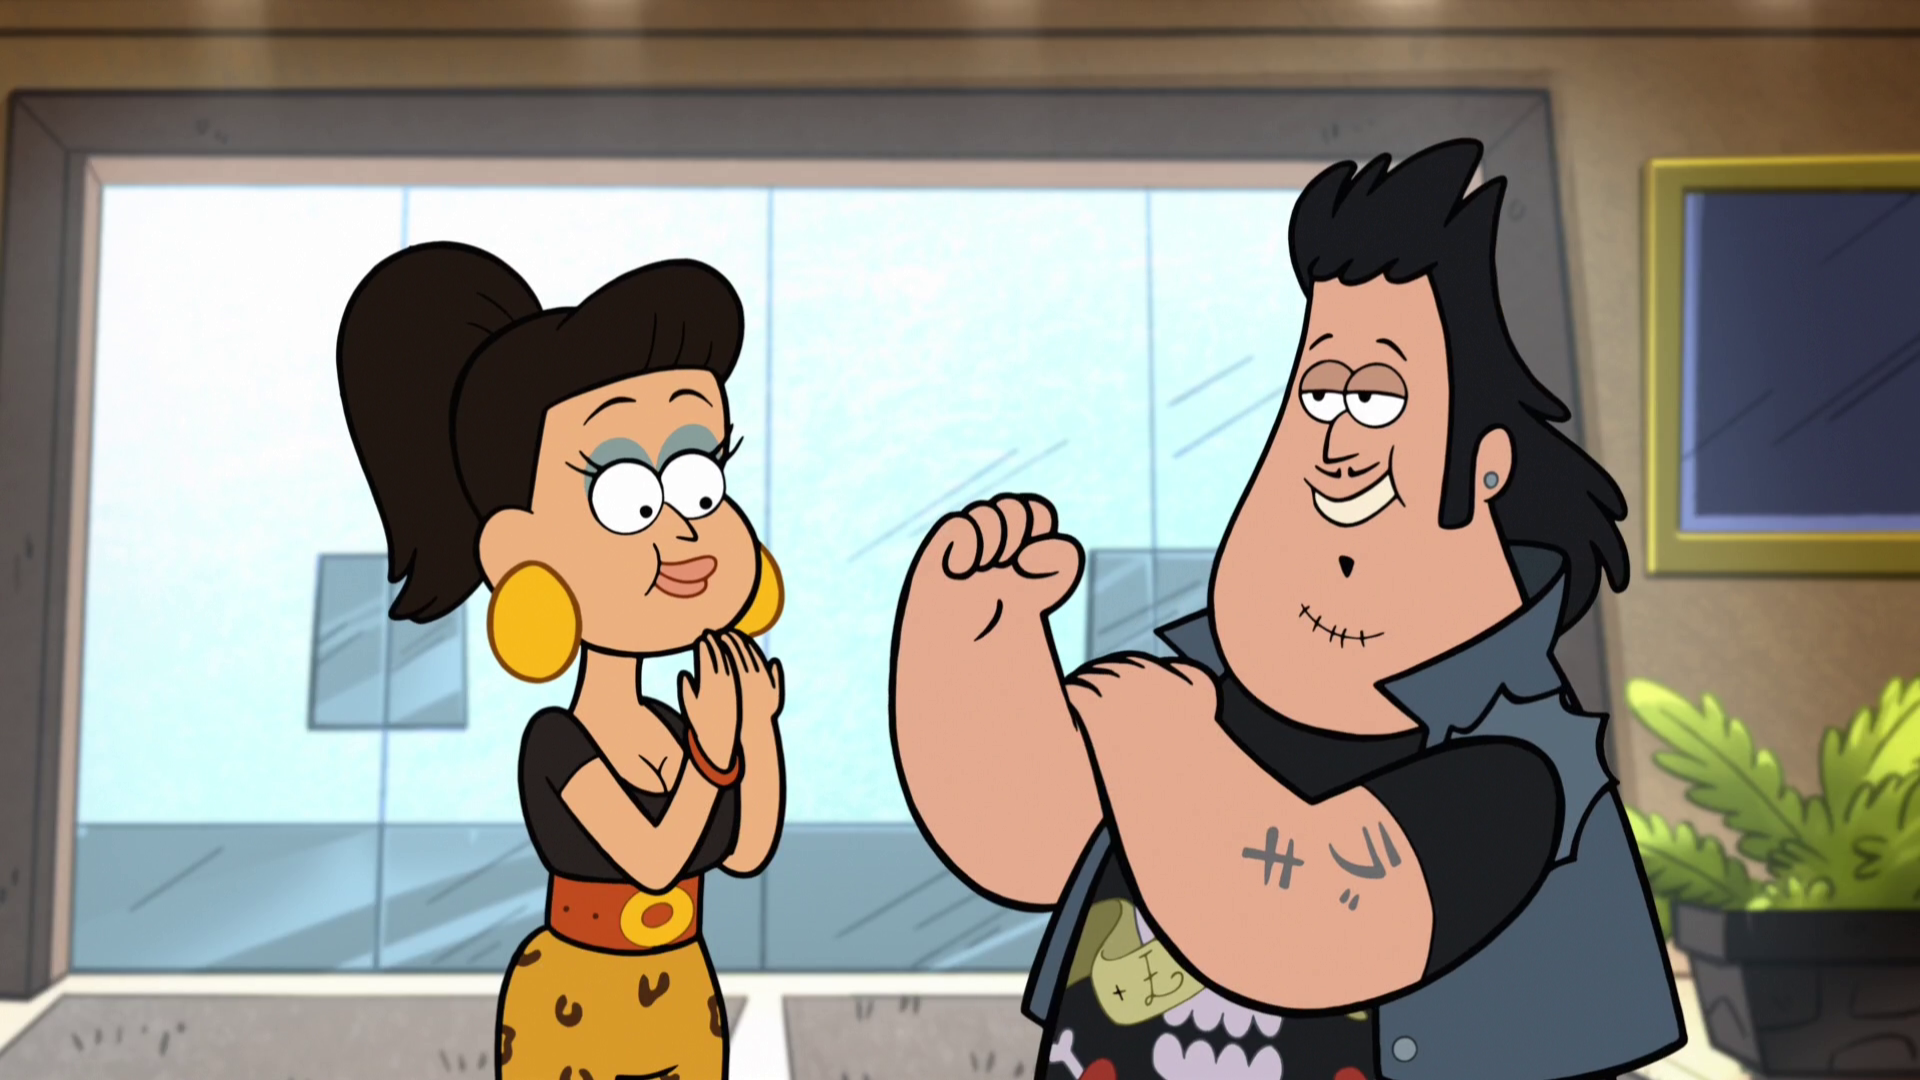 Reggie (Gravity Falls)